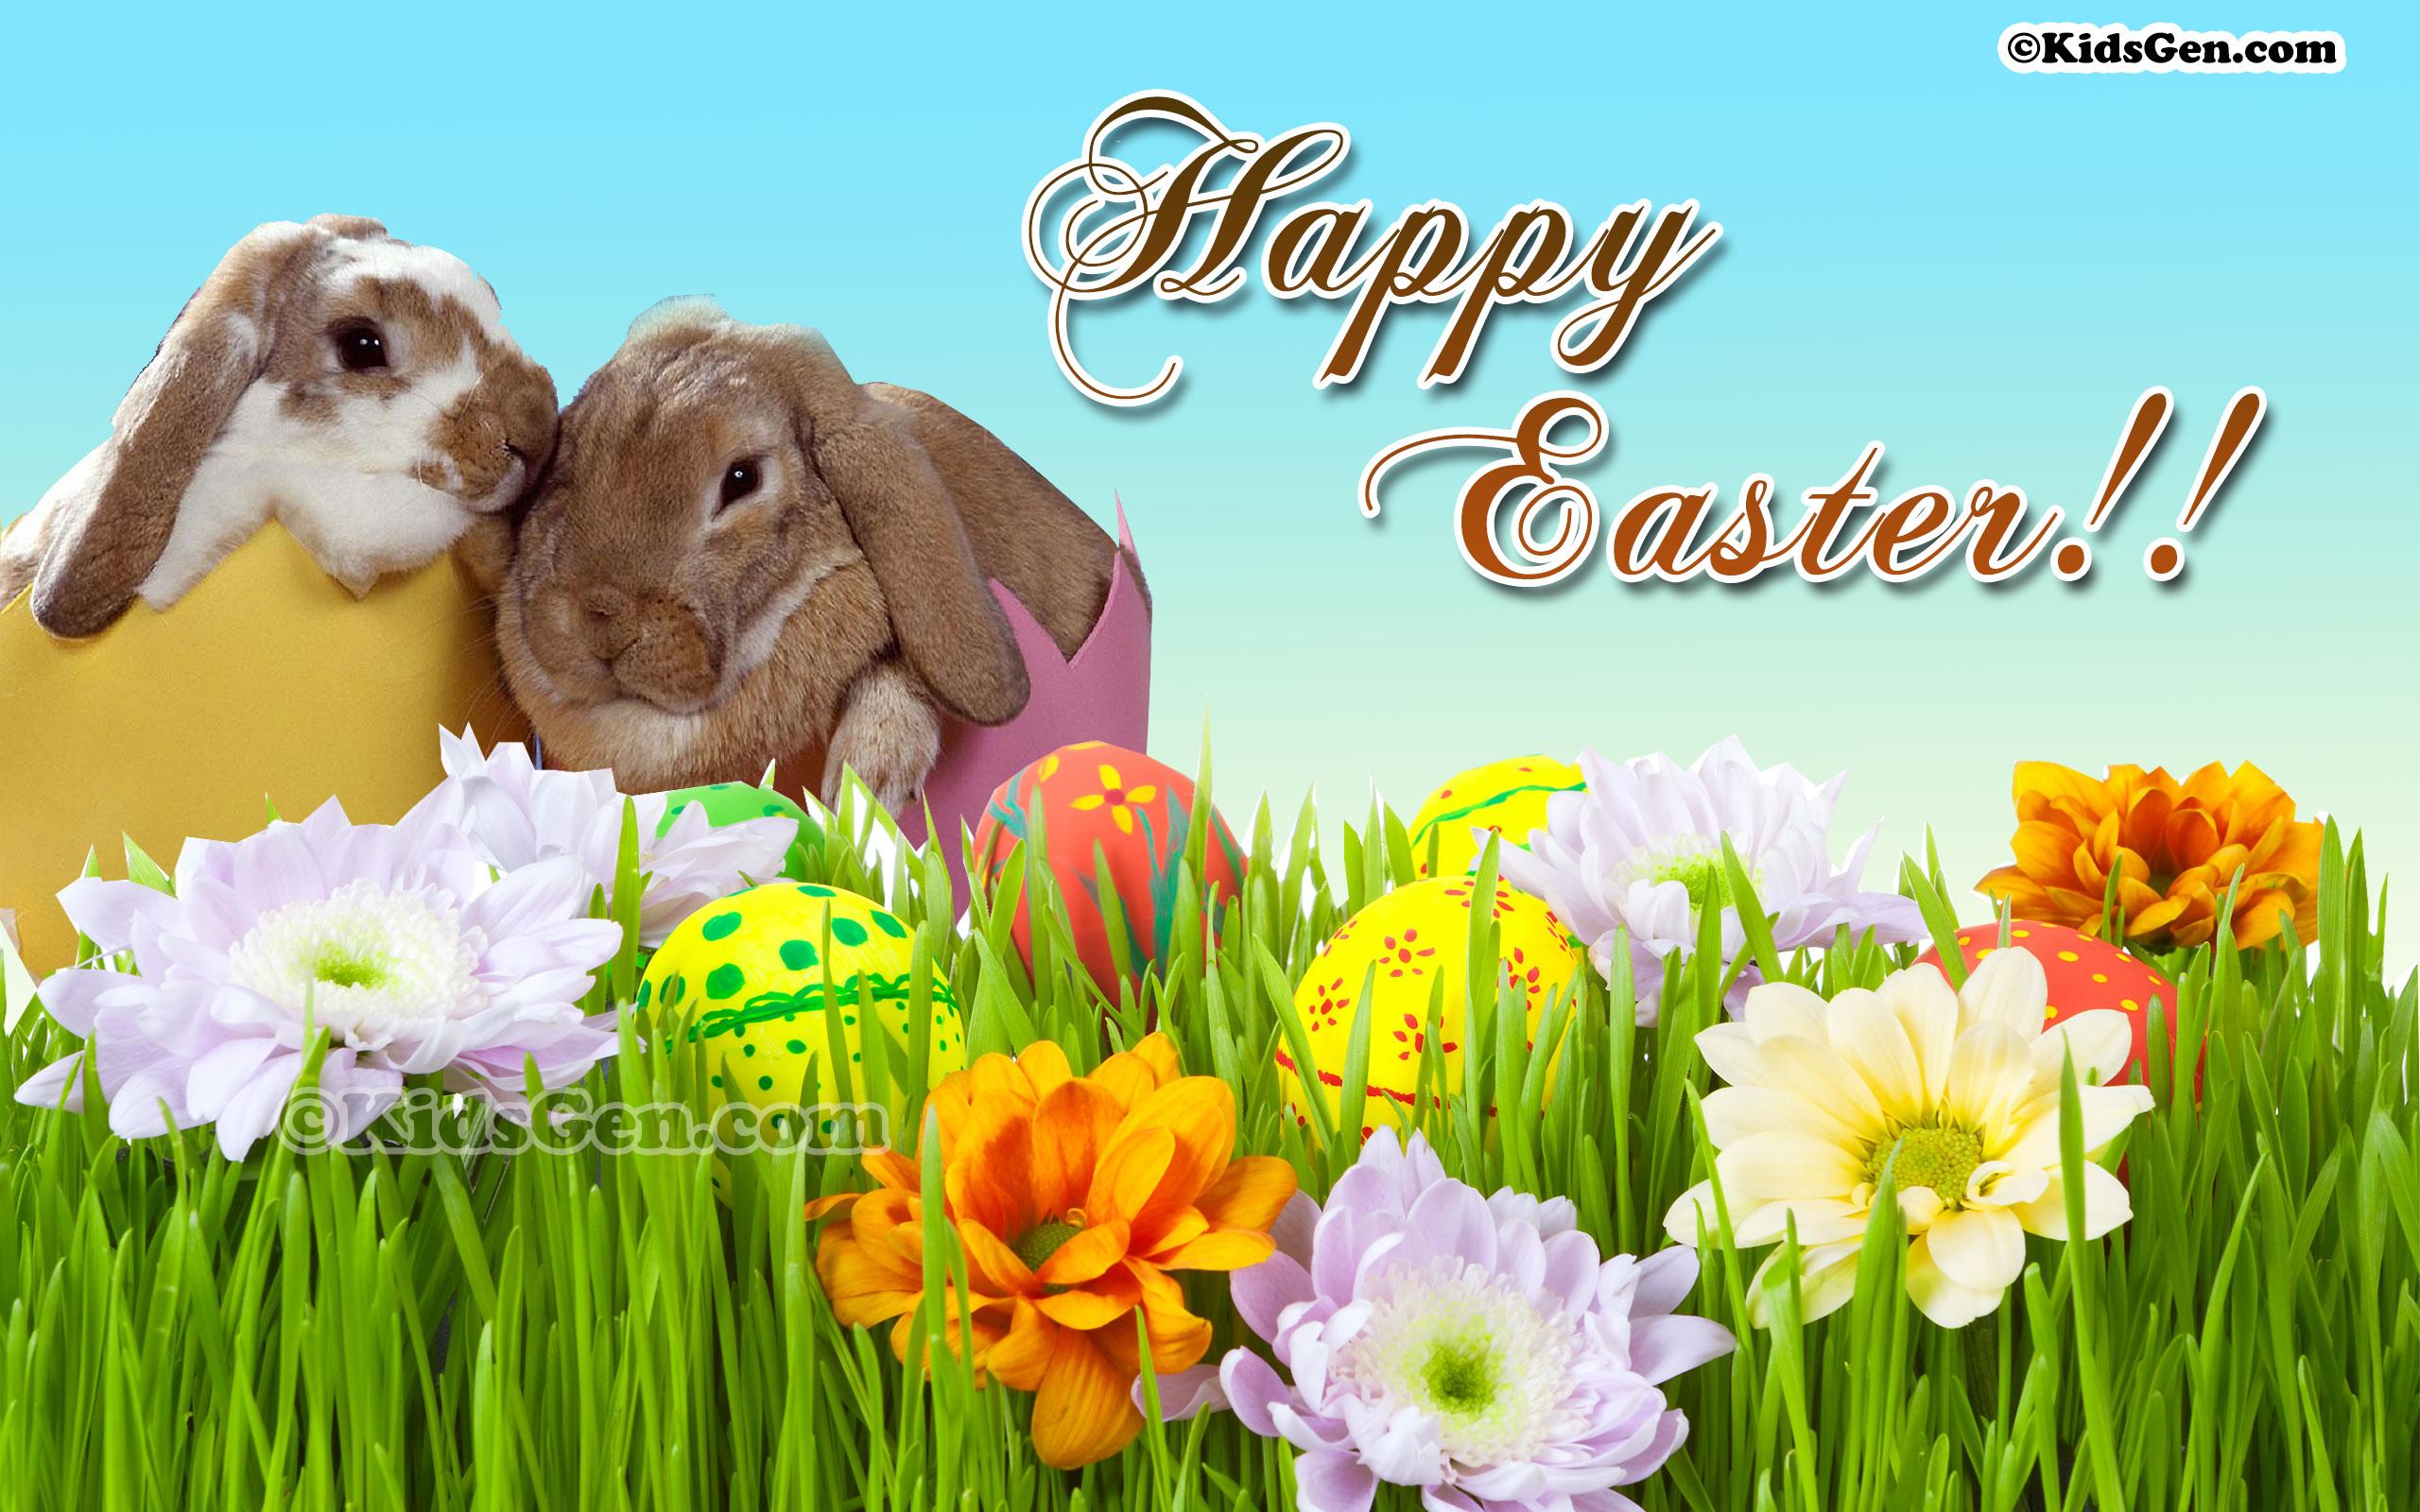 12 hd easter wallpapers for kids - Easter desktop wallpaper ...